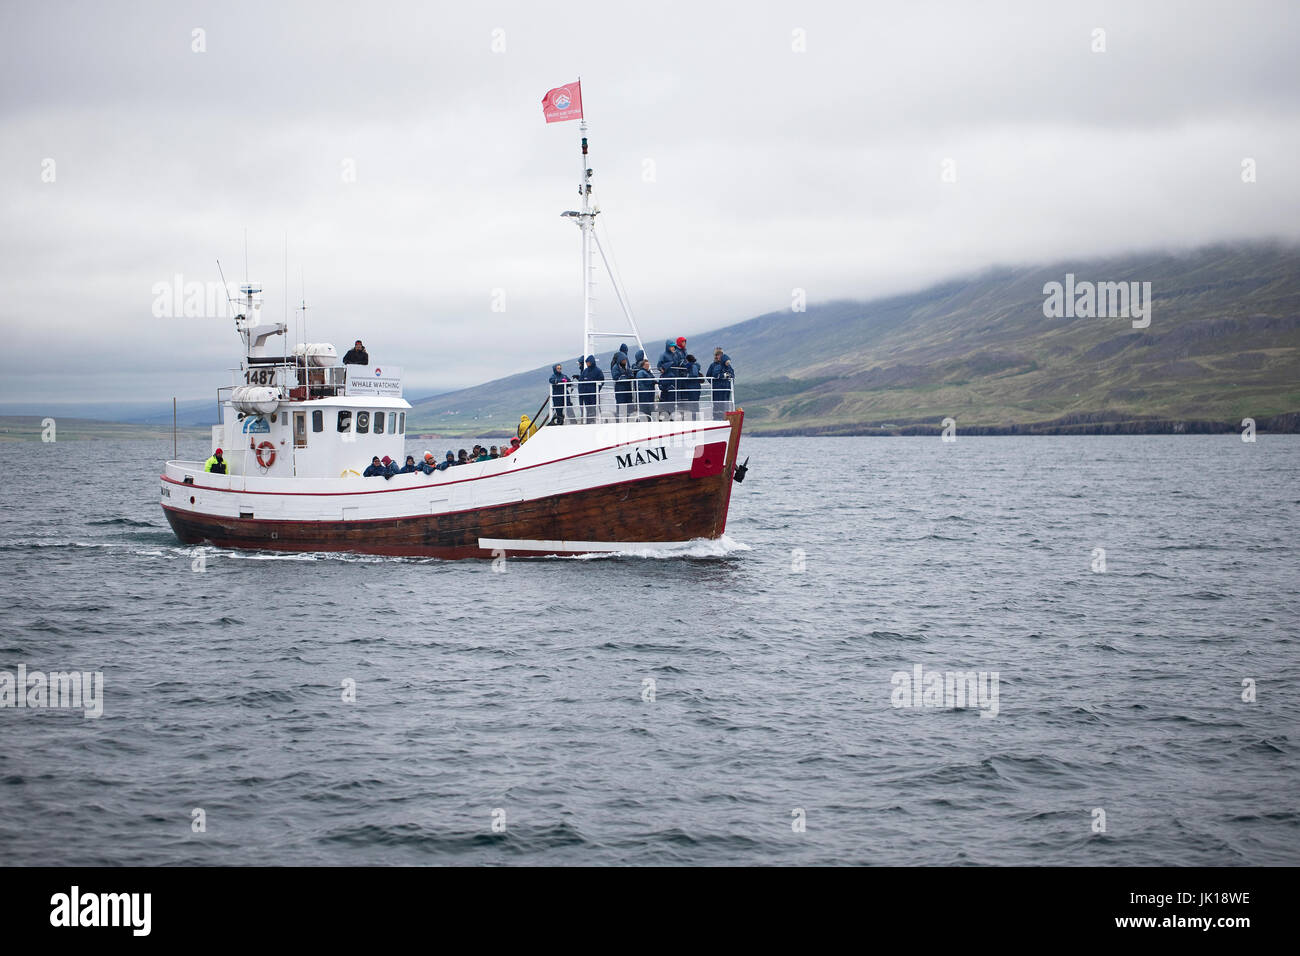 Humpback Whale (Megaptera novaeangliae) Iceland IS June 2017 - Stock Image